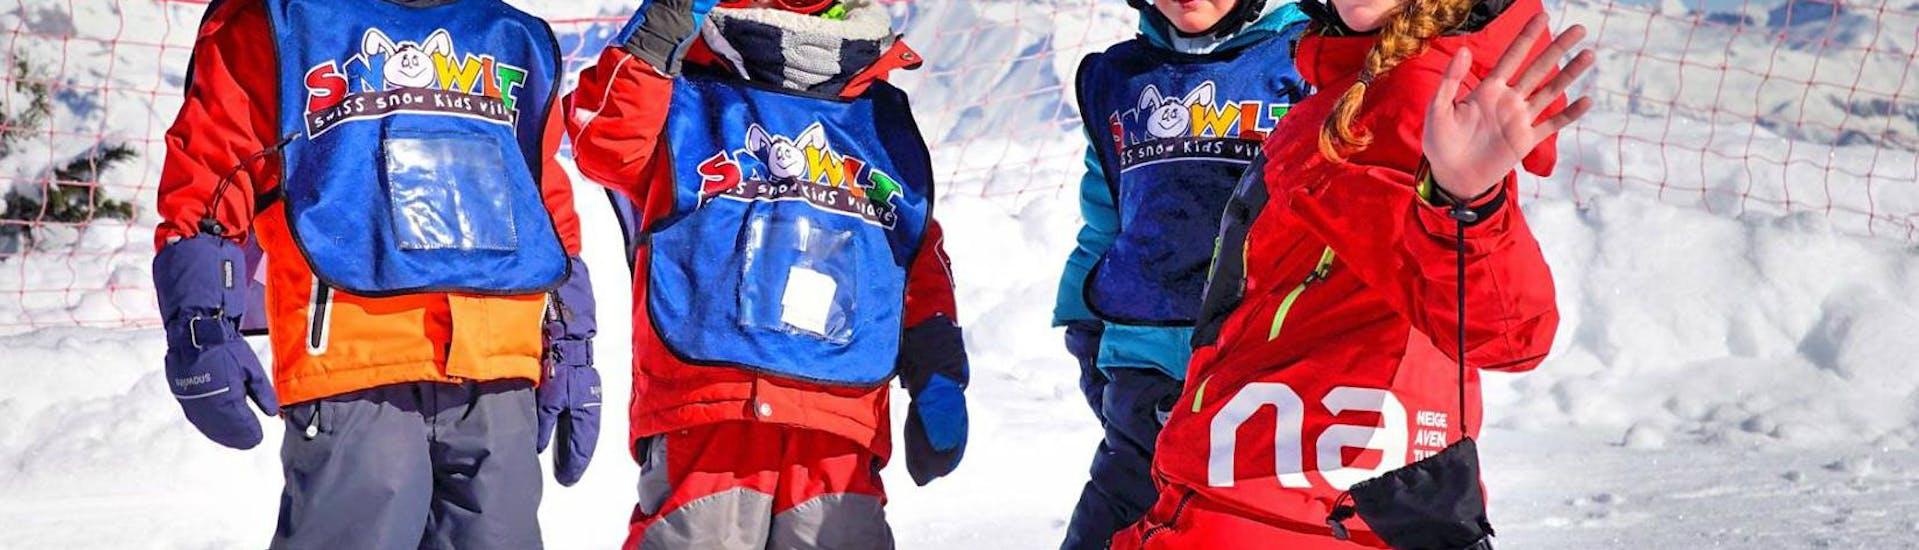 Ski Lessons Kids (5-12 years) - Incl. Equipment - Nendaz